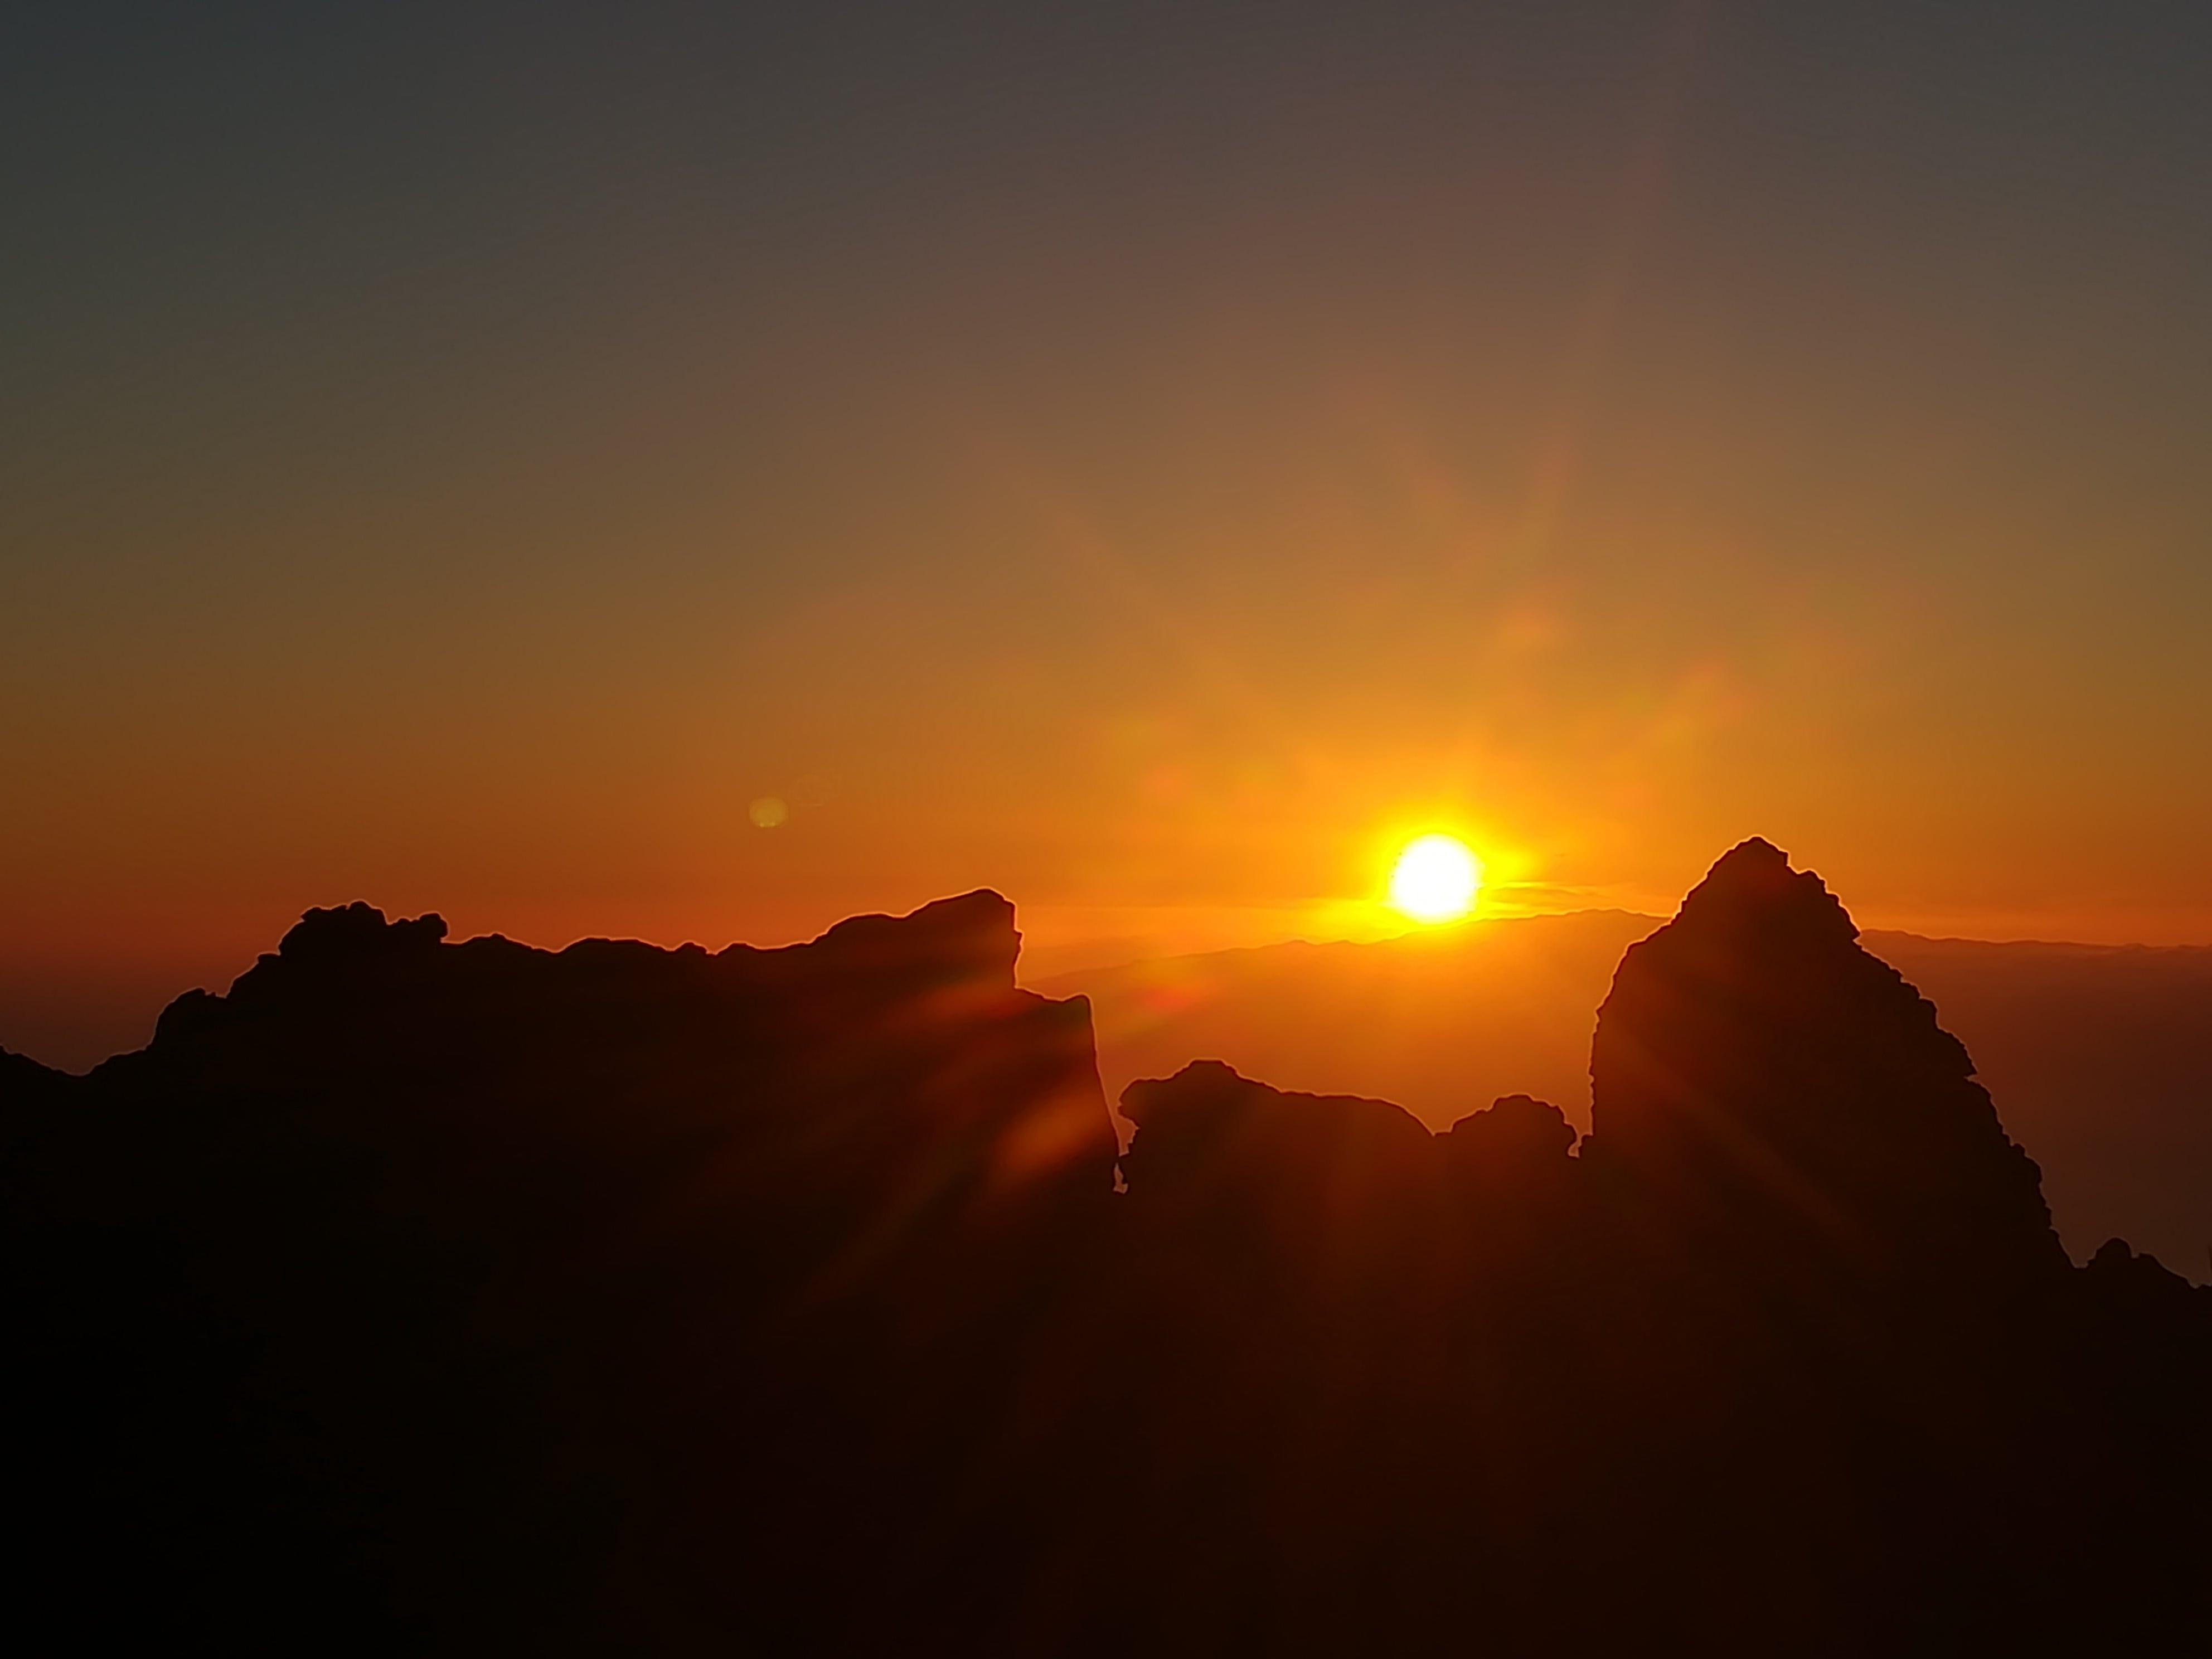 Sonnenuntergang Felsen#